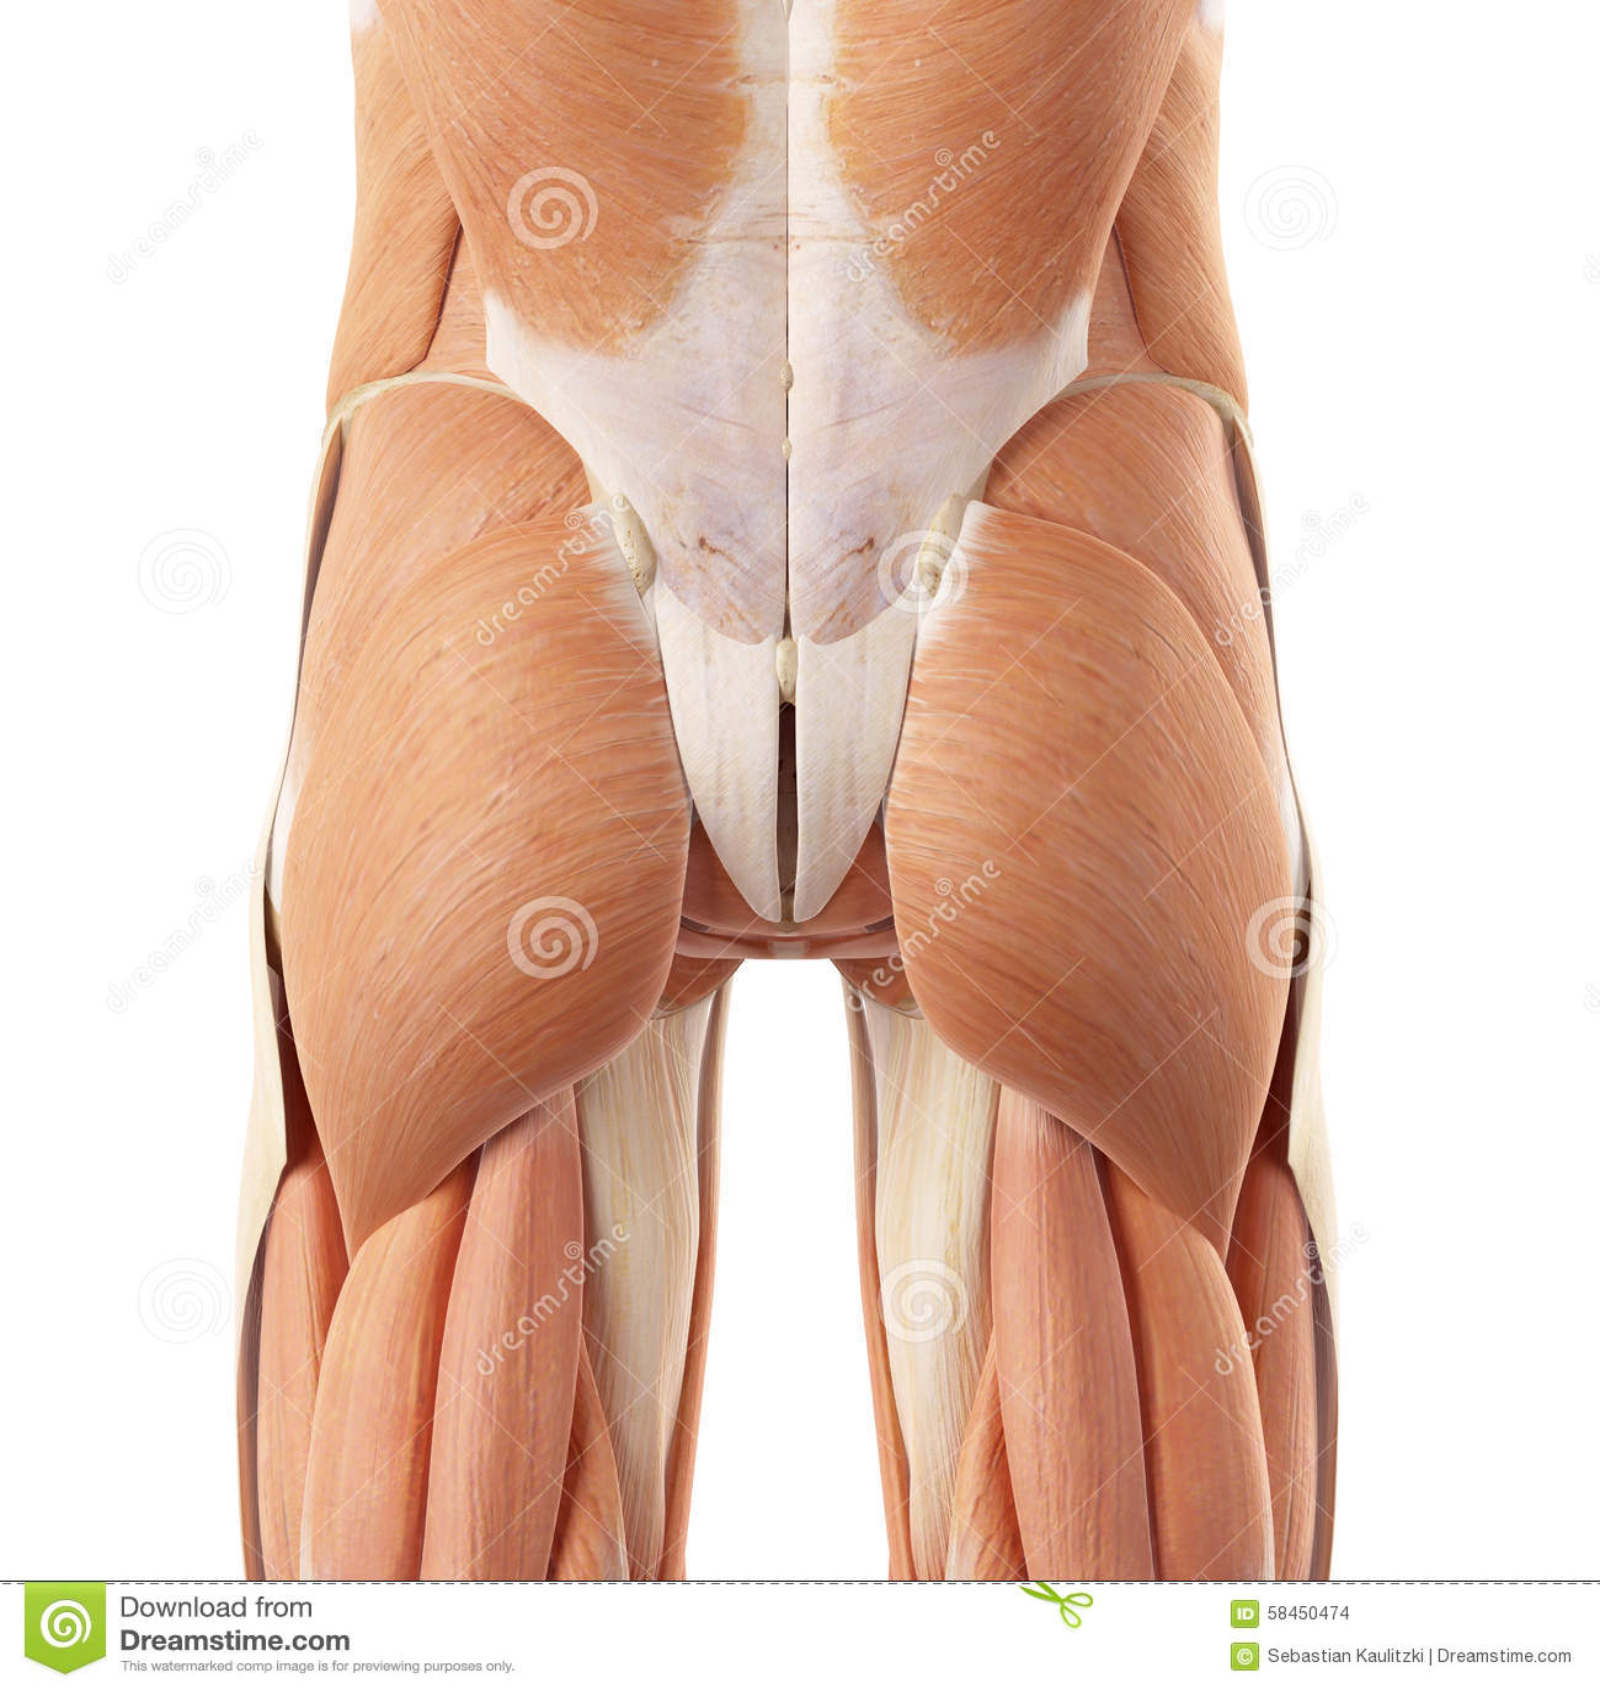 The bottom muscles stock illustration. Illustration of system - 58450474